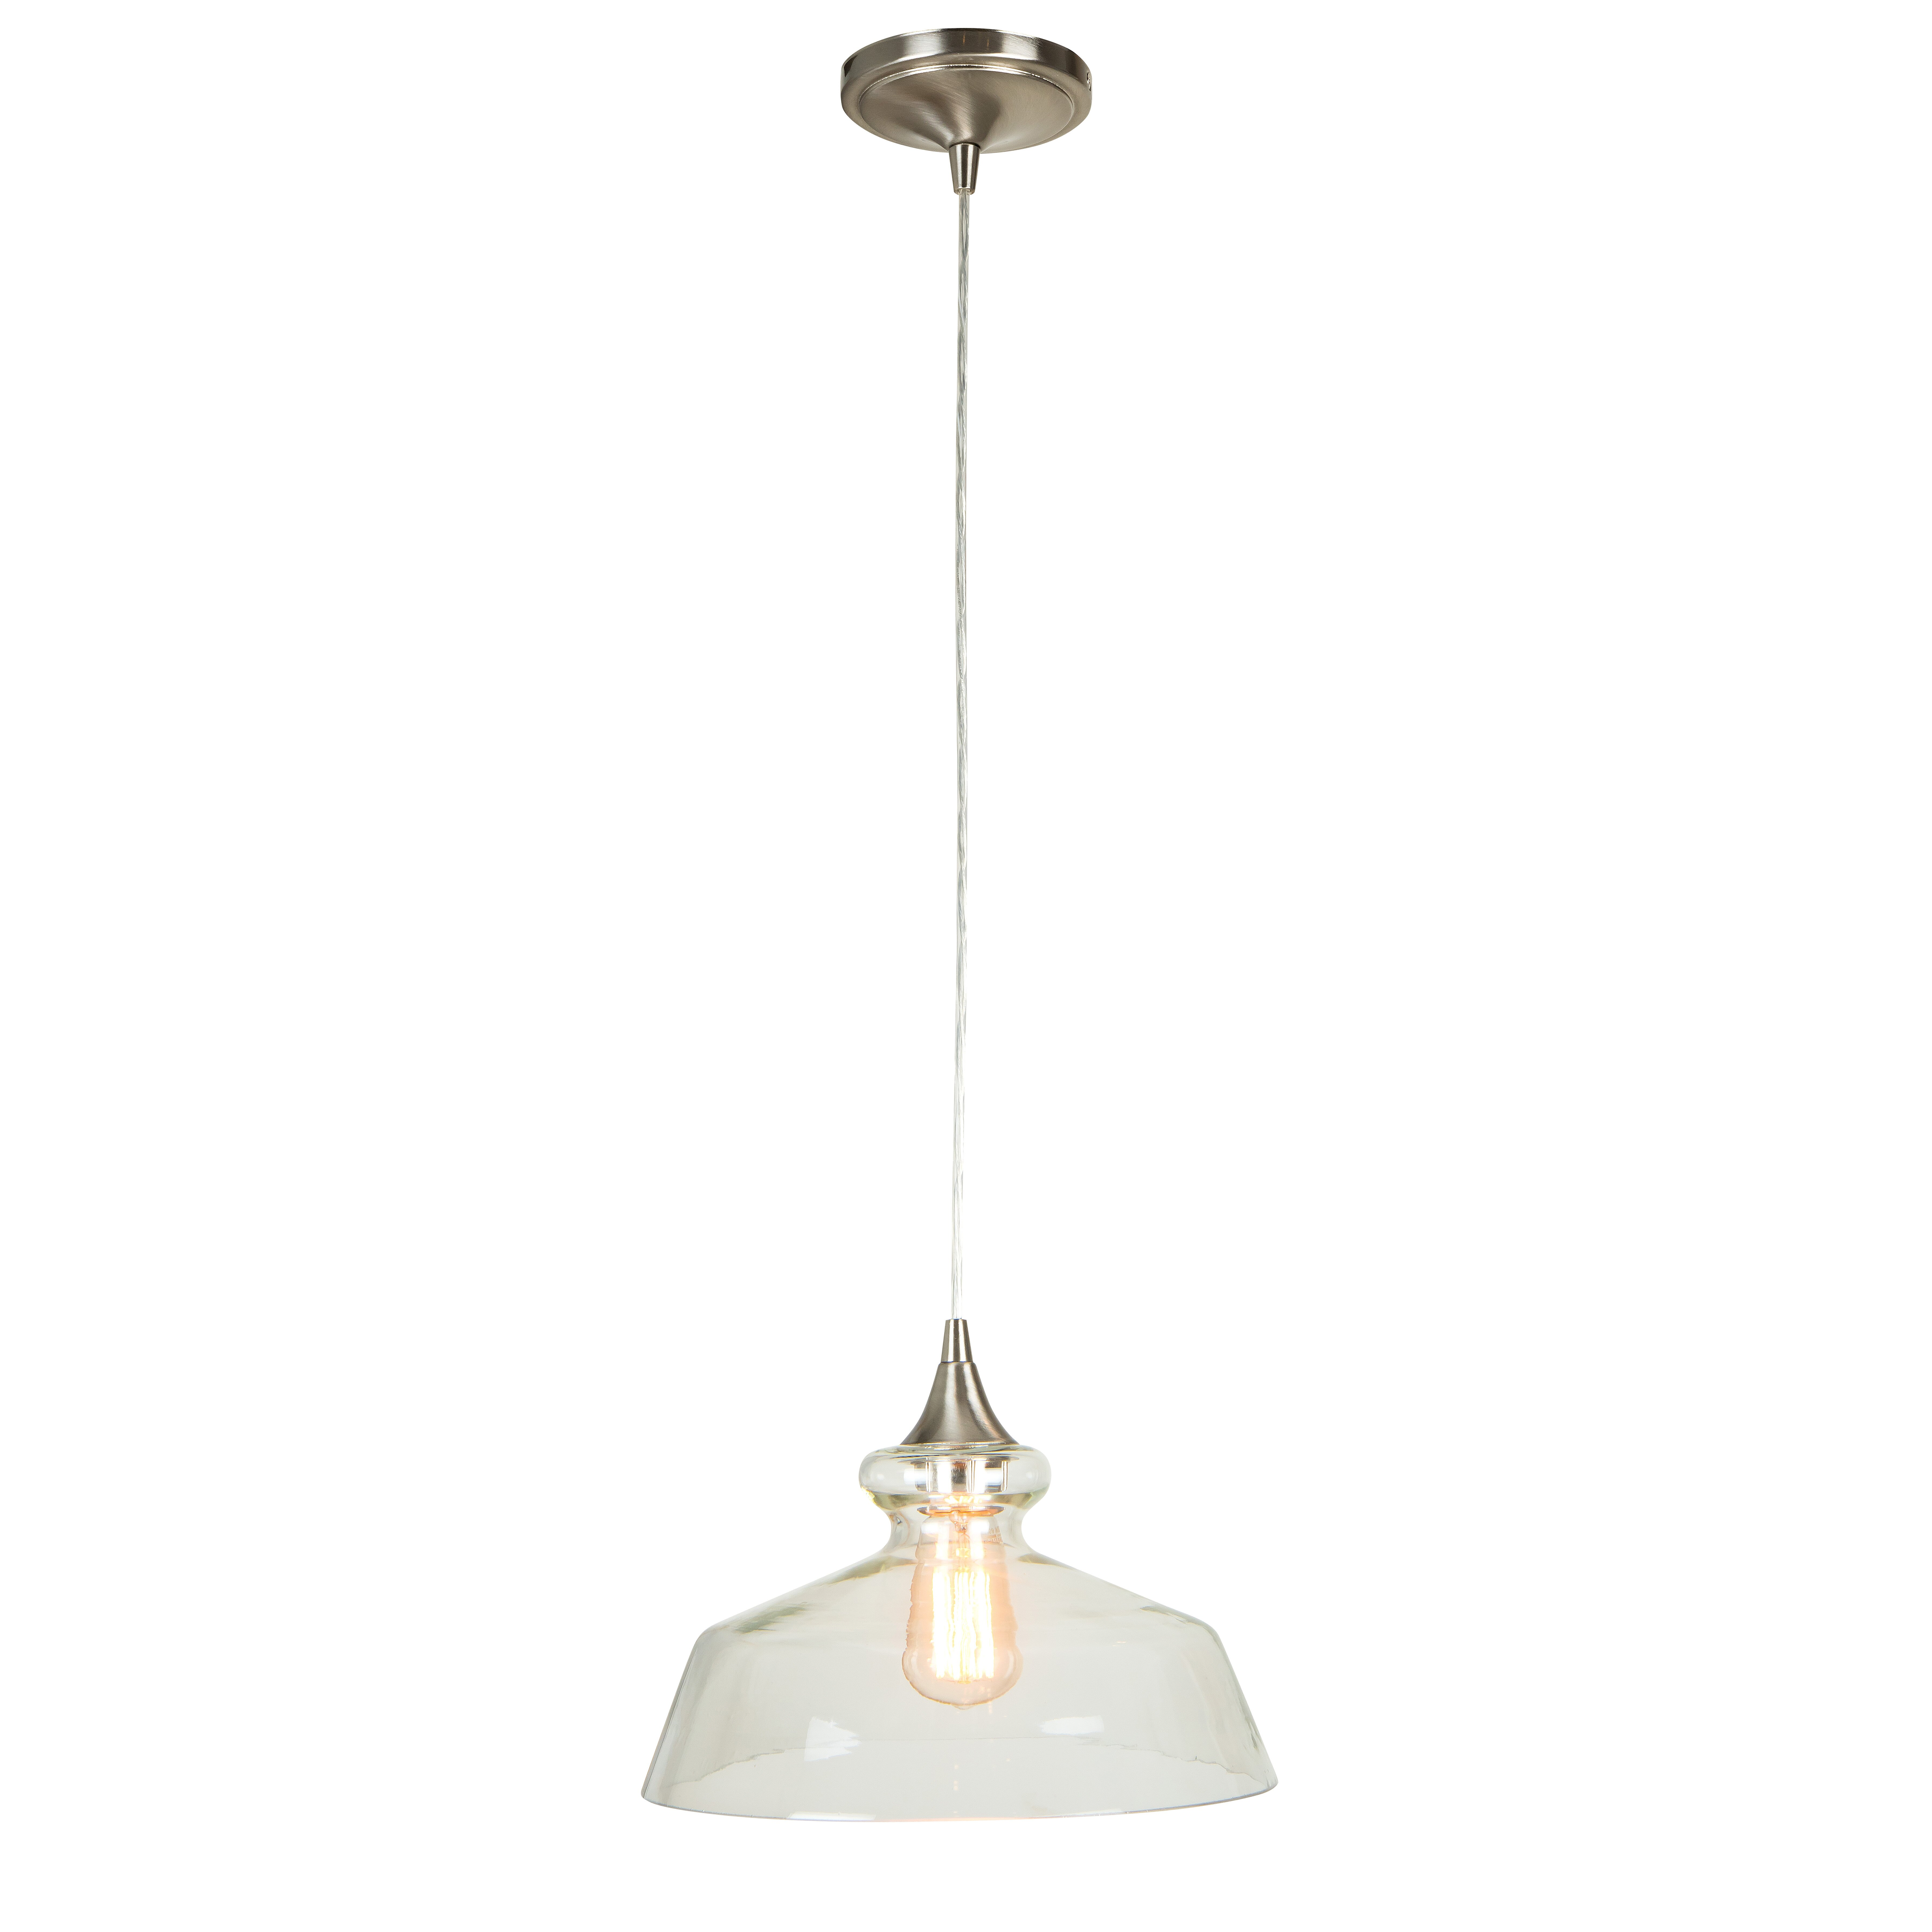 lighting ceiling lights mini pendants jeremiah sku jrmh1698